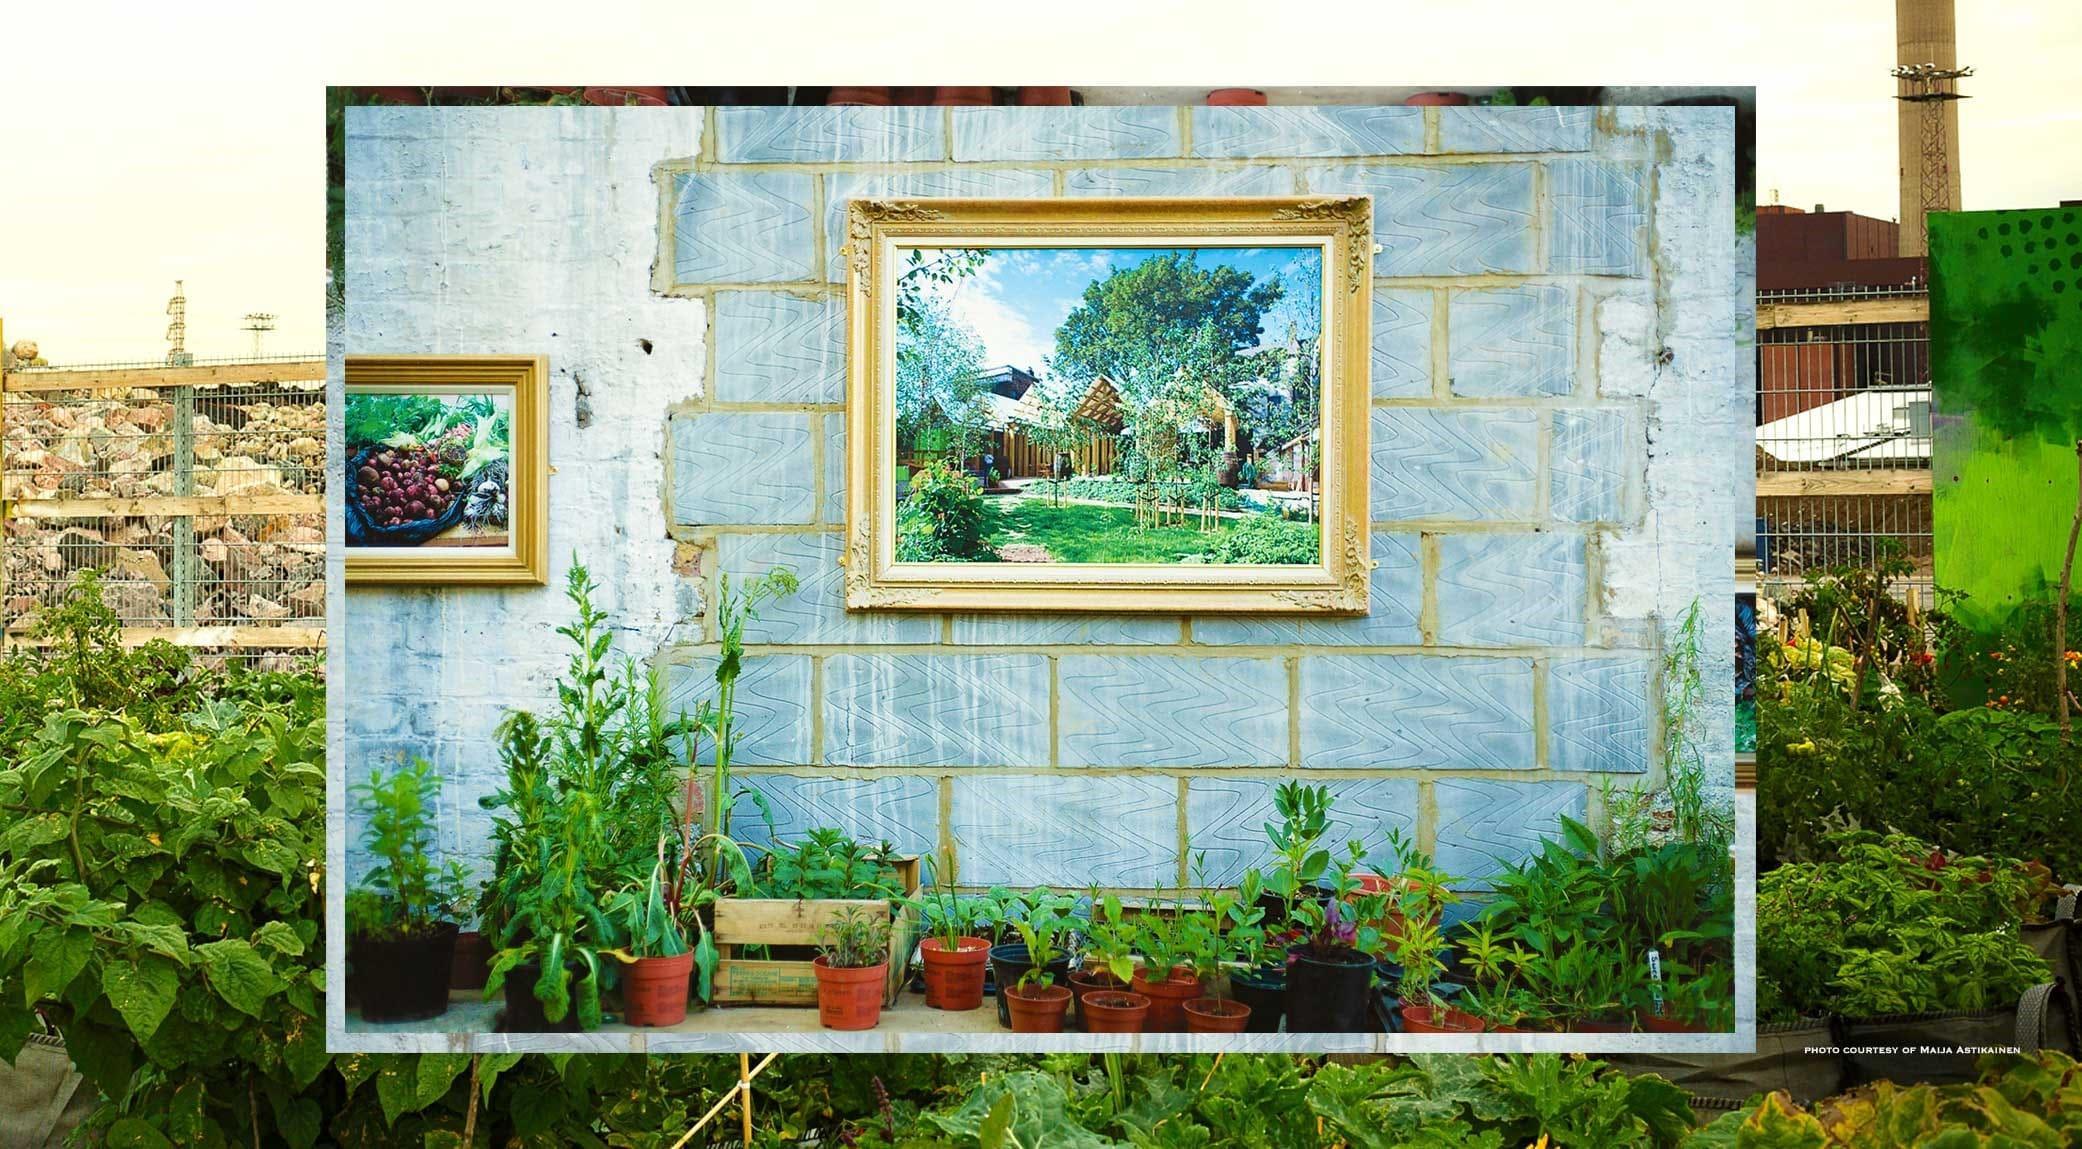 original_001-Horticultured-Cities-finedininglovers.jpg-.jpg